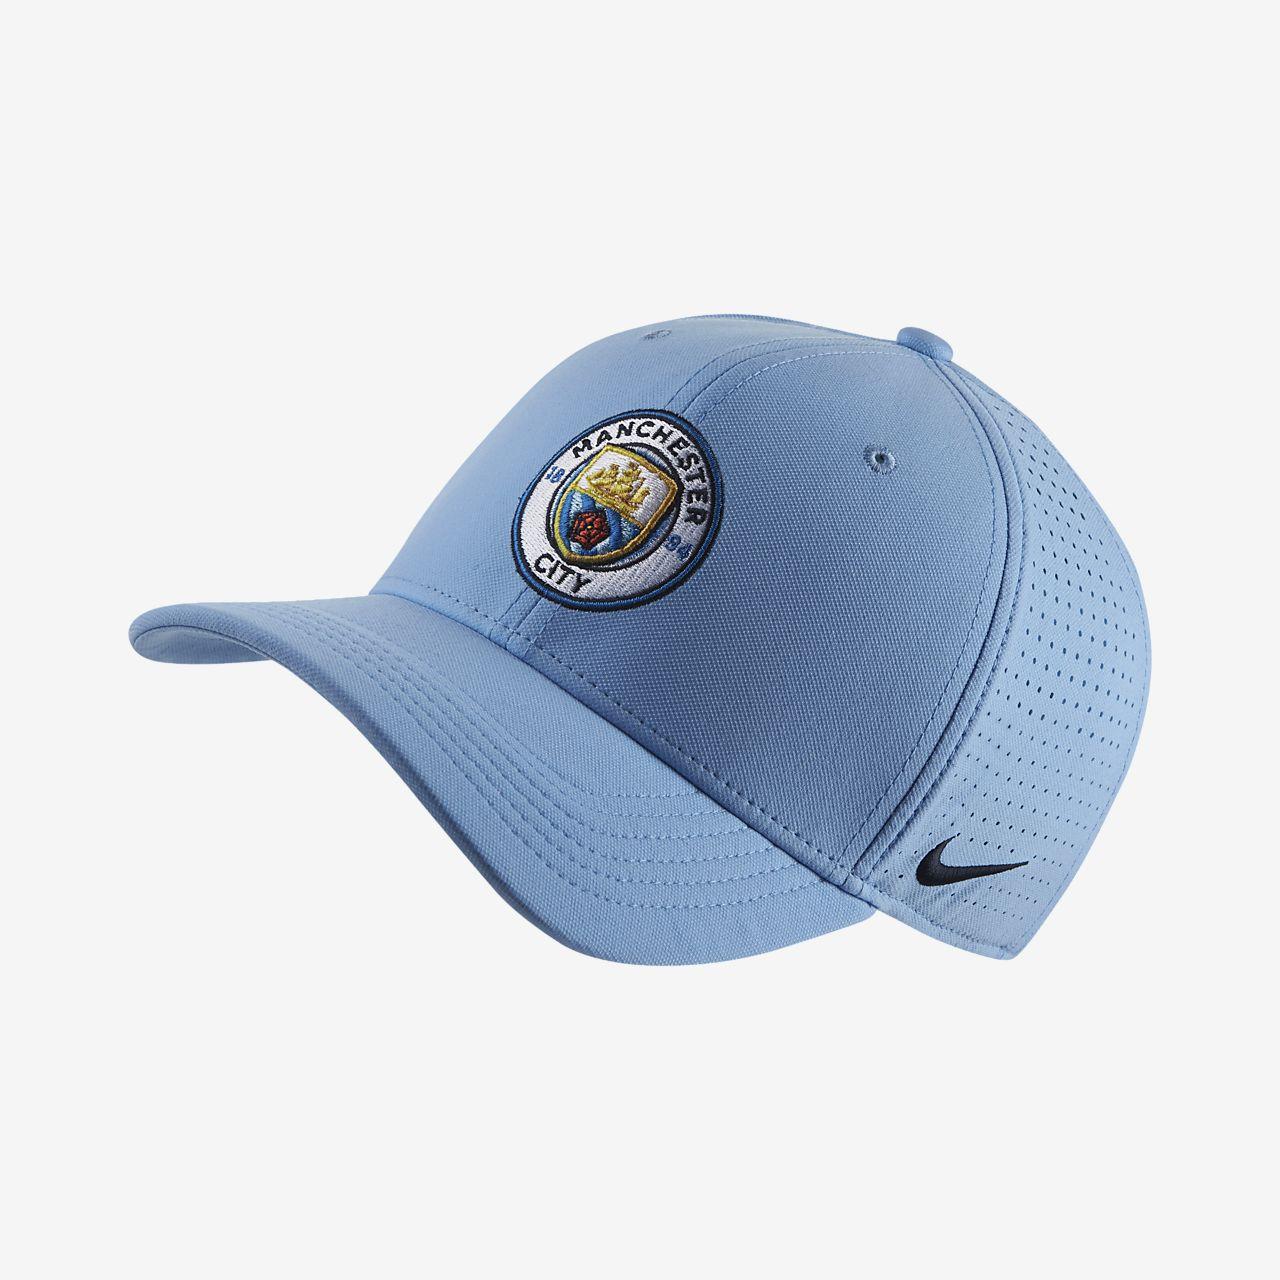 76b691883925f Manchester City FC AeroBill Classic99 Adjustable Hat. Nike.com NZ